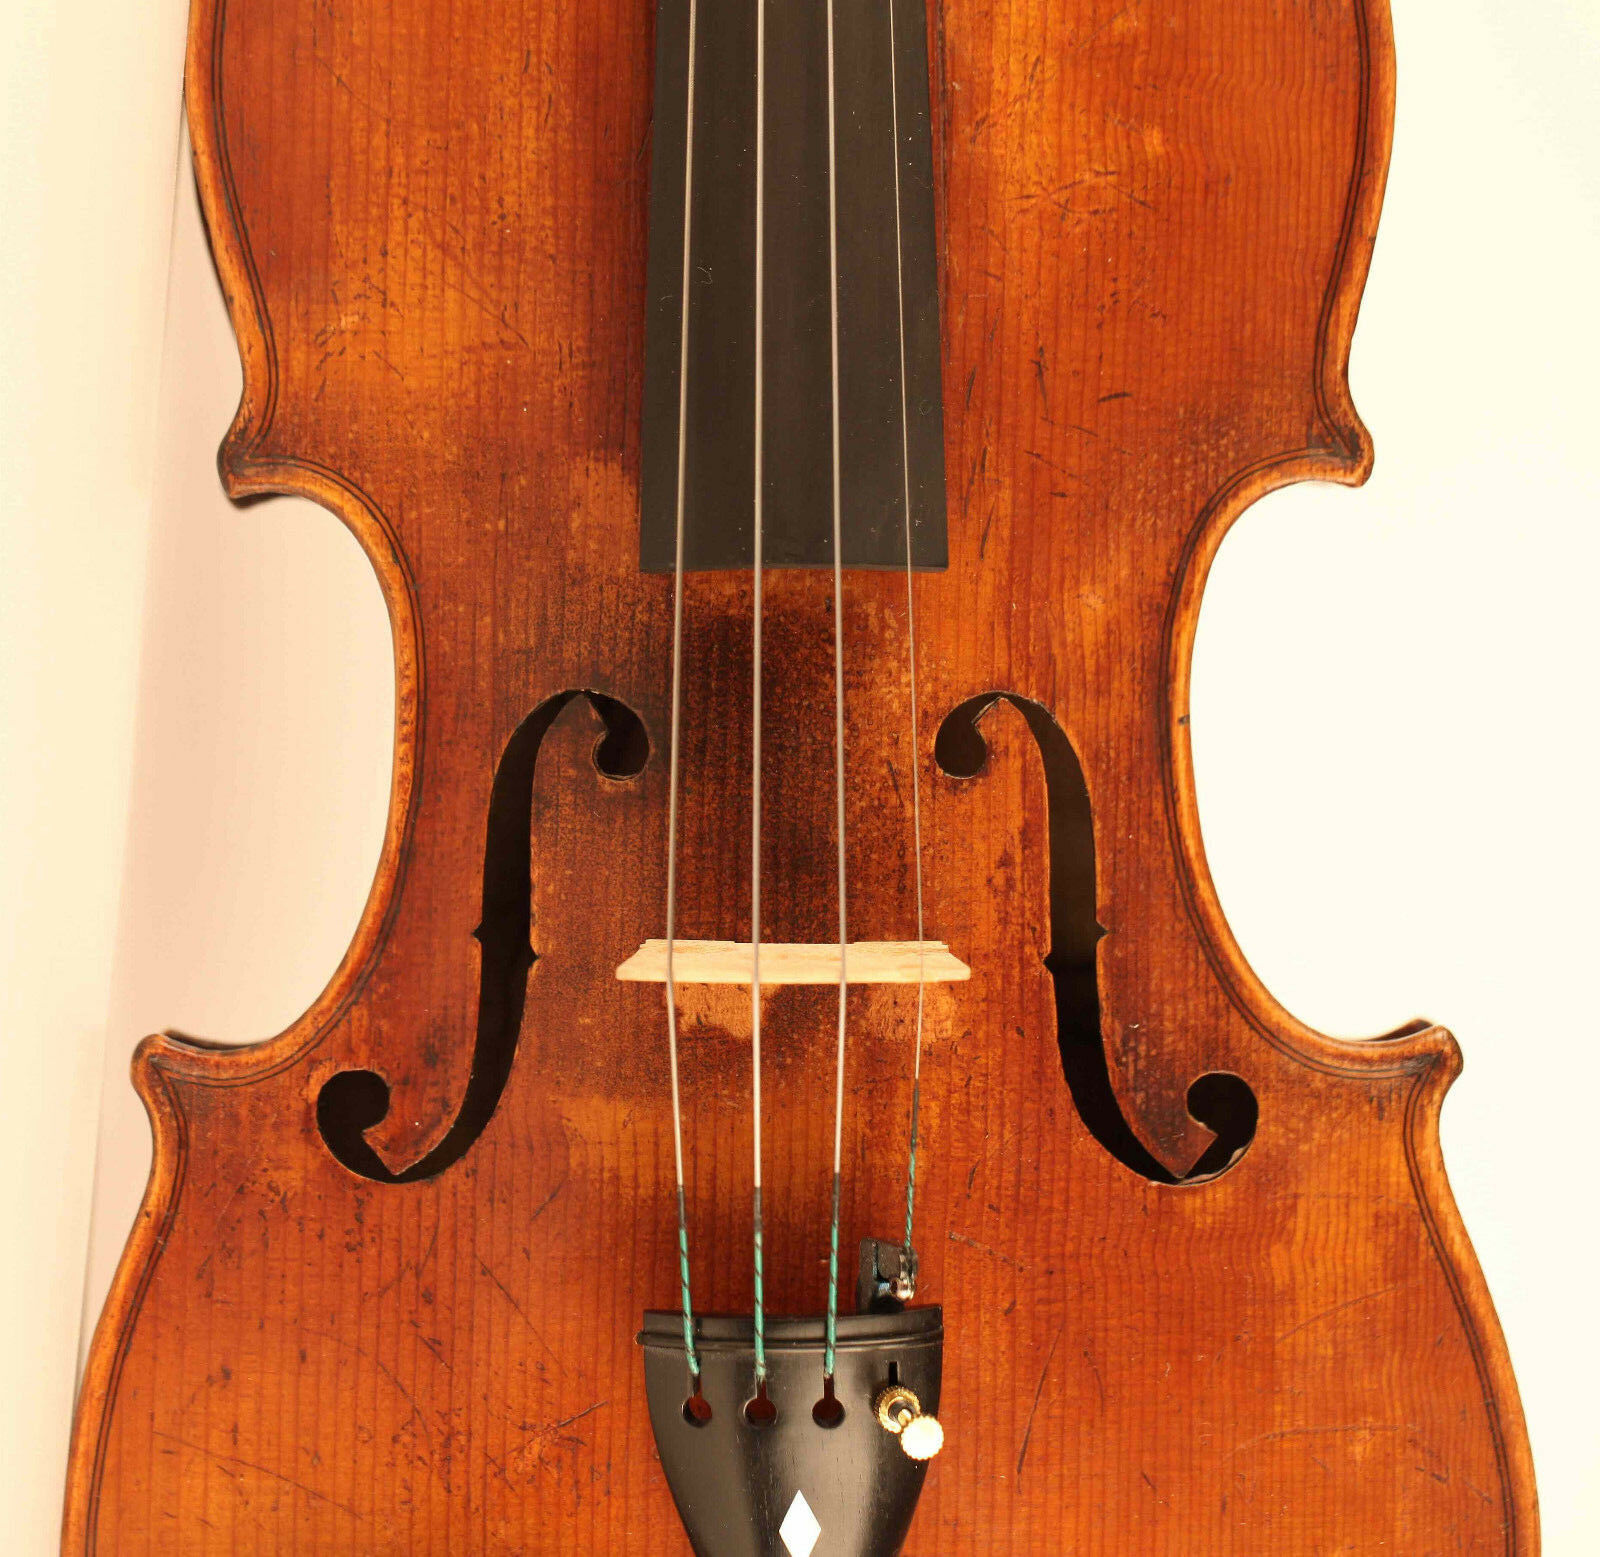 Vieja fino violín Rocca 1859 小提琴 ヴァイオリン ヴァイオリン ヴァイオリン old viola violin violonchelo violon Italian ac42b9